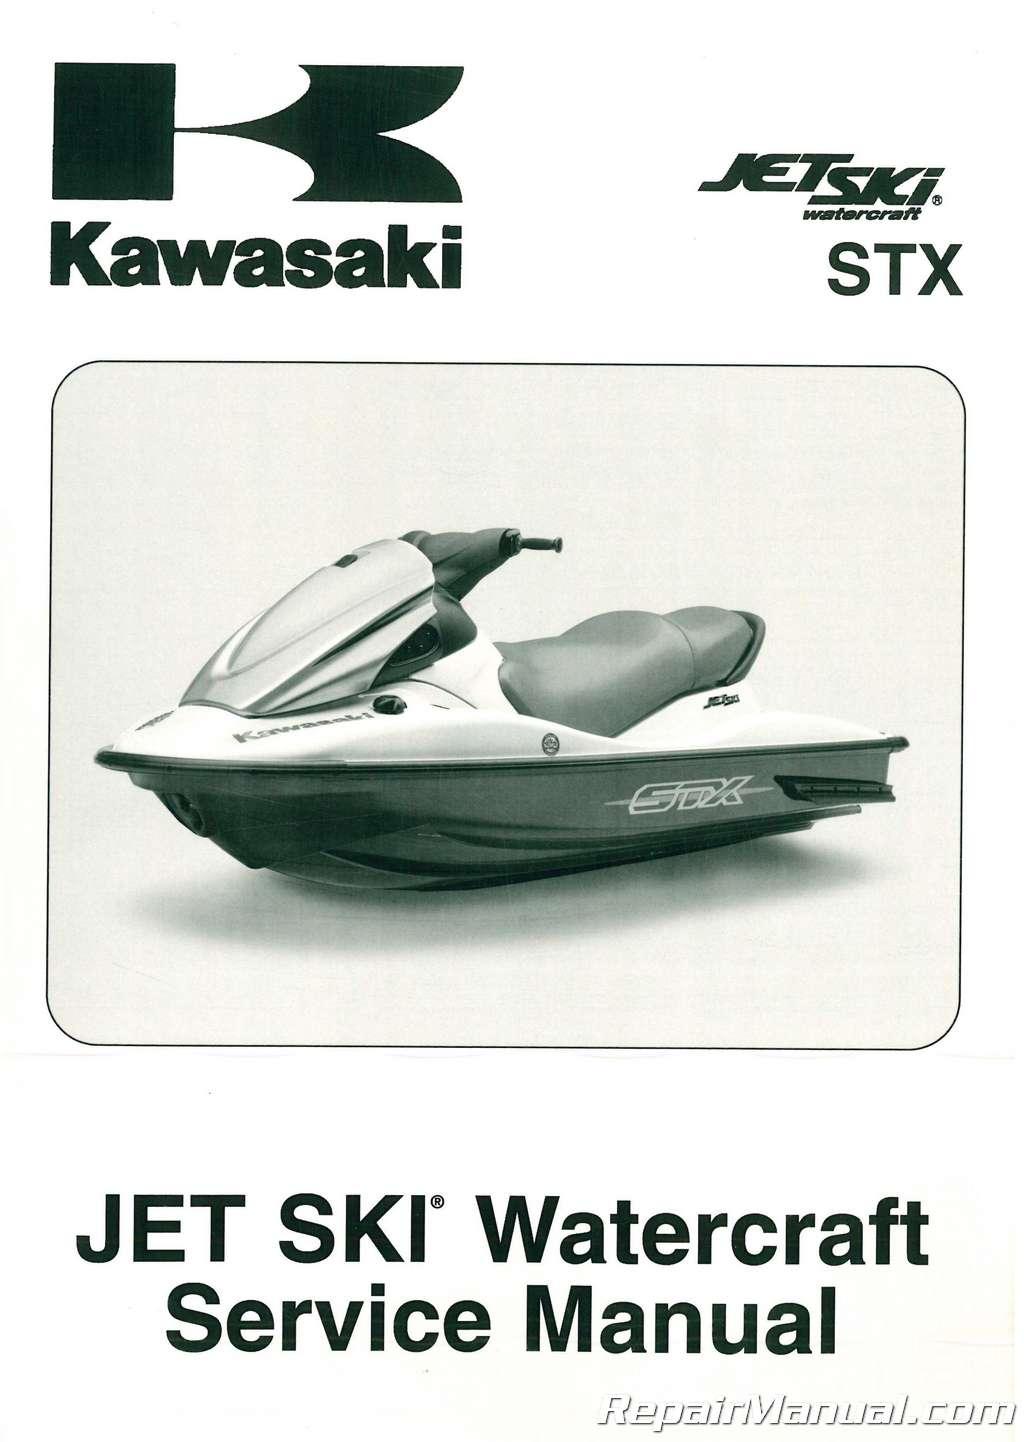 2009 2010 kawasaki jt1500d stx jet ski factory service manual rh repairmanual com Watercraft Jet Ski Rental Bremer Sea-Doo Jet Ski Watercraft